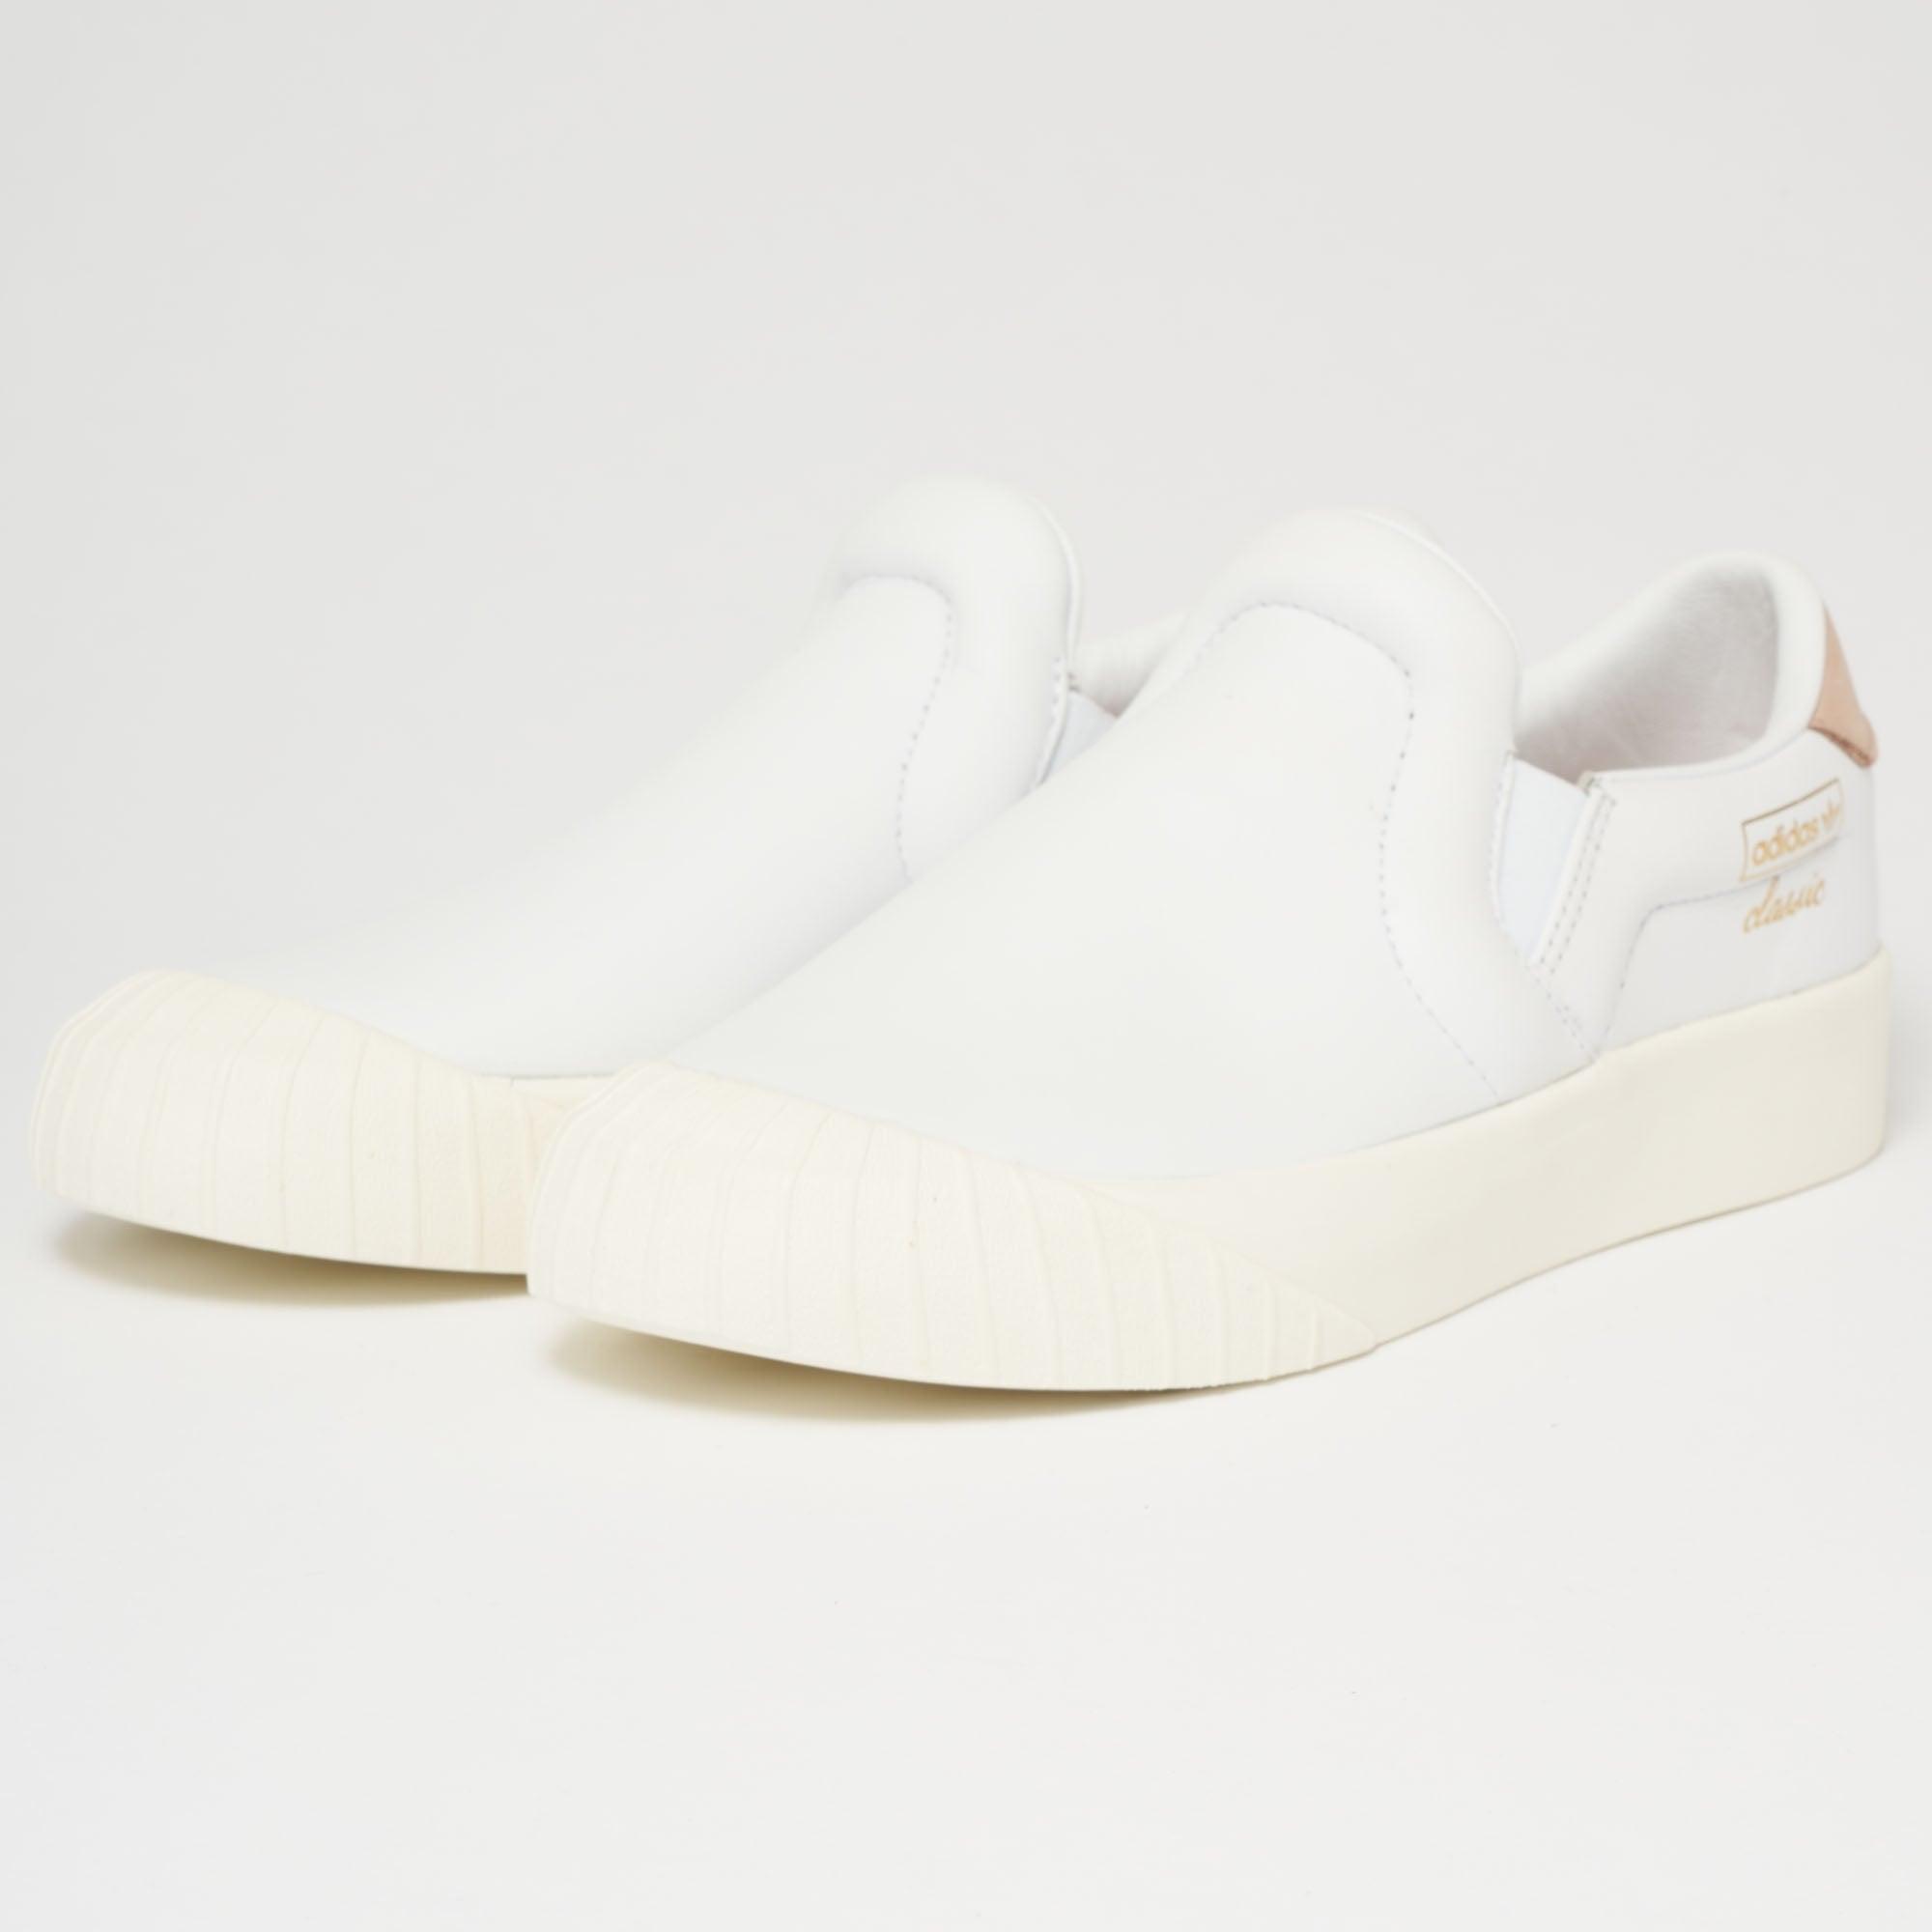 3072f9785c7 Adidas Womens Everyn Slip-On Trainer (FTW White) at Dandy Fellow